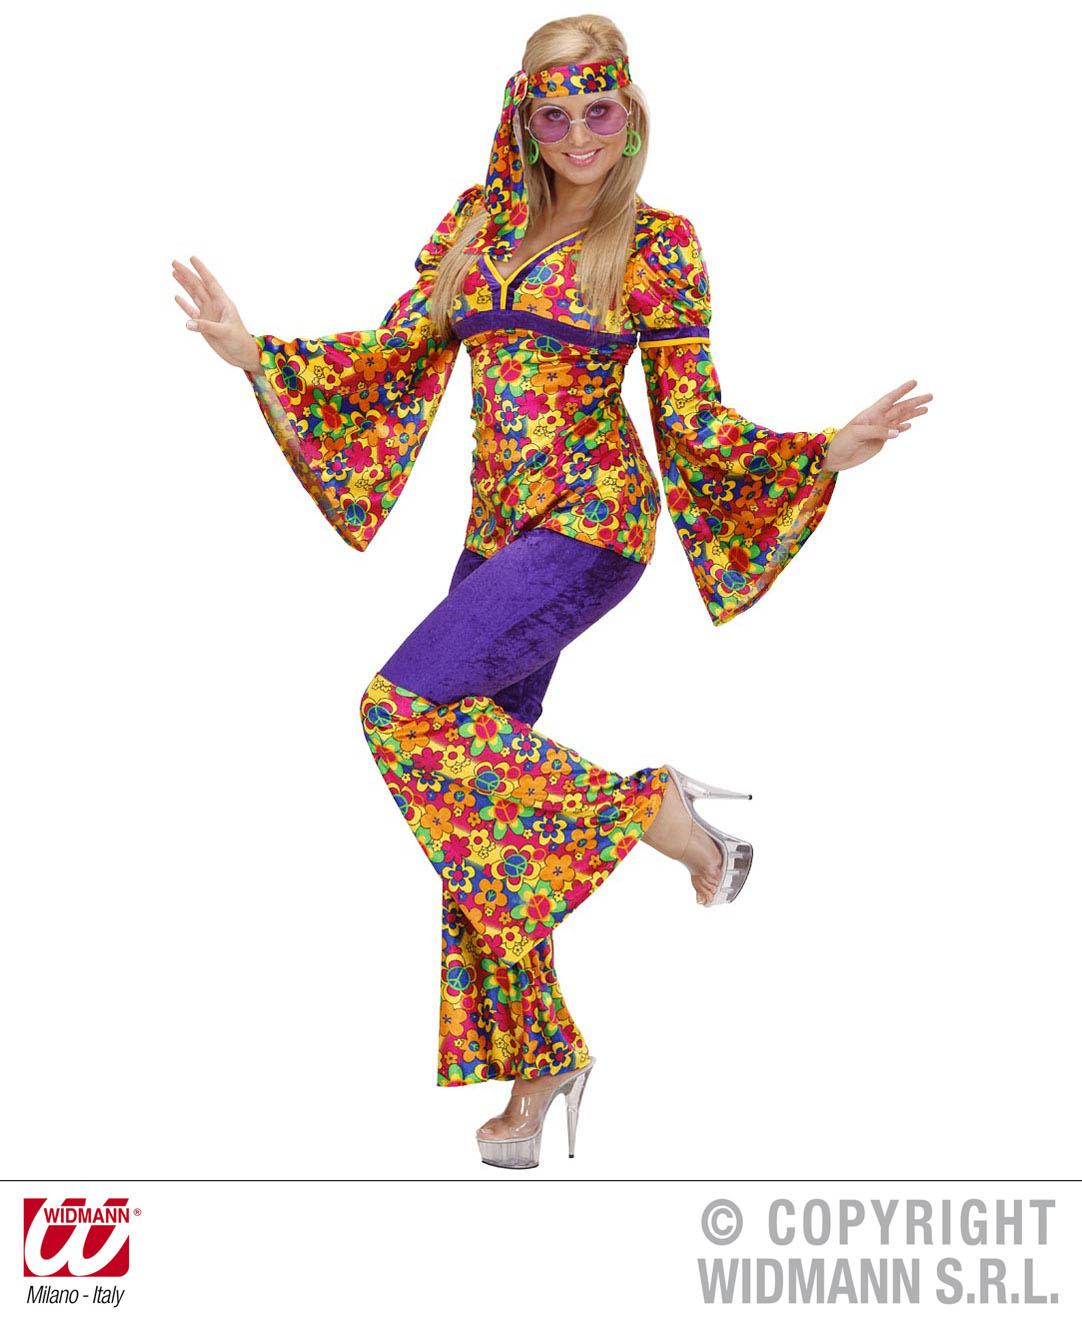 70er Woodstock Hippie Kostüm 3tlg. Damen S -36-38, M -38-40, L -40-42, XL 42-44